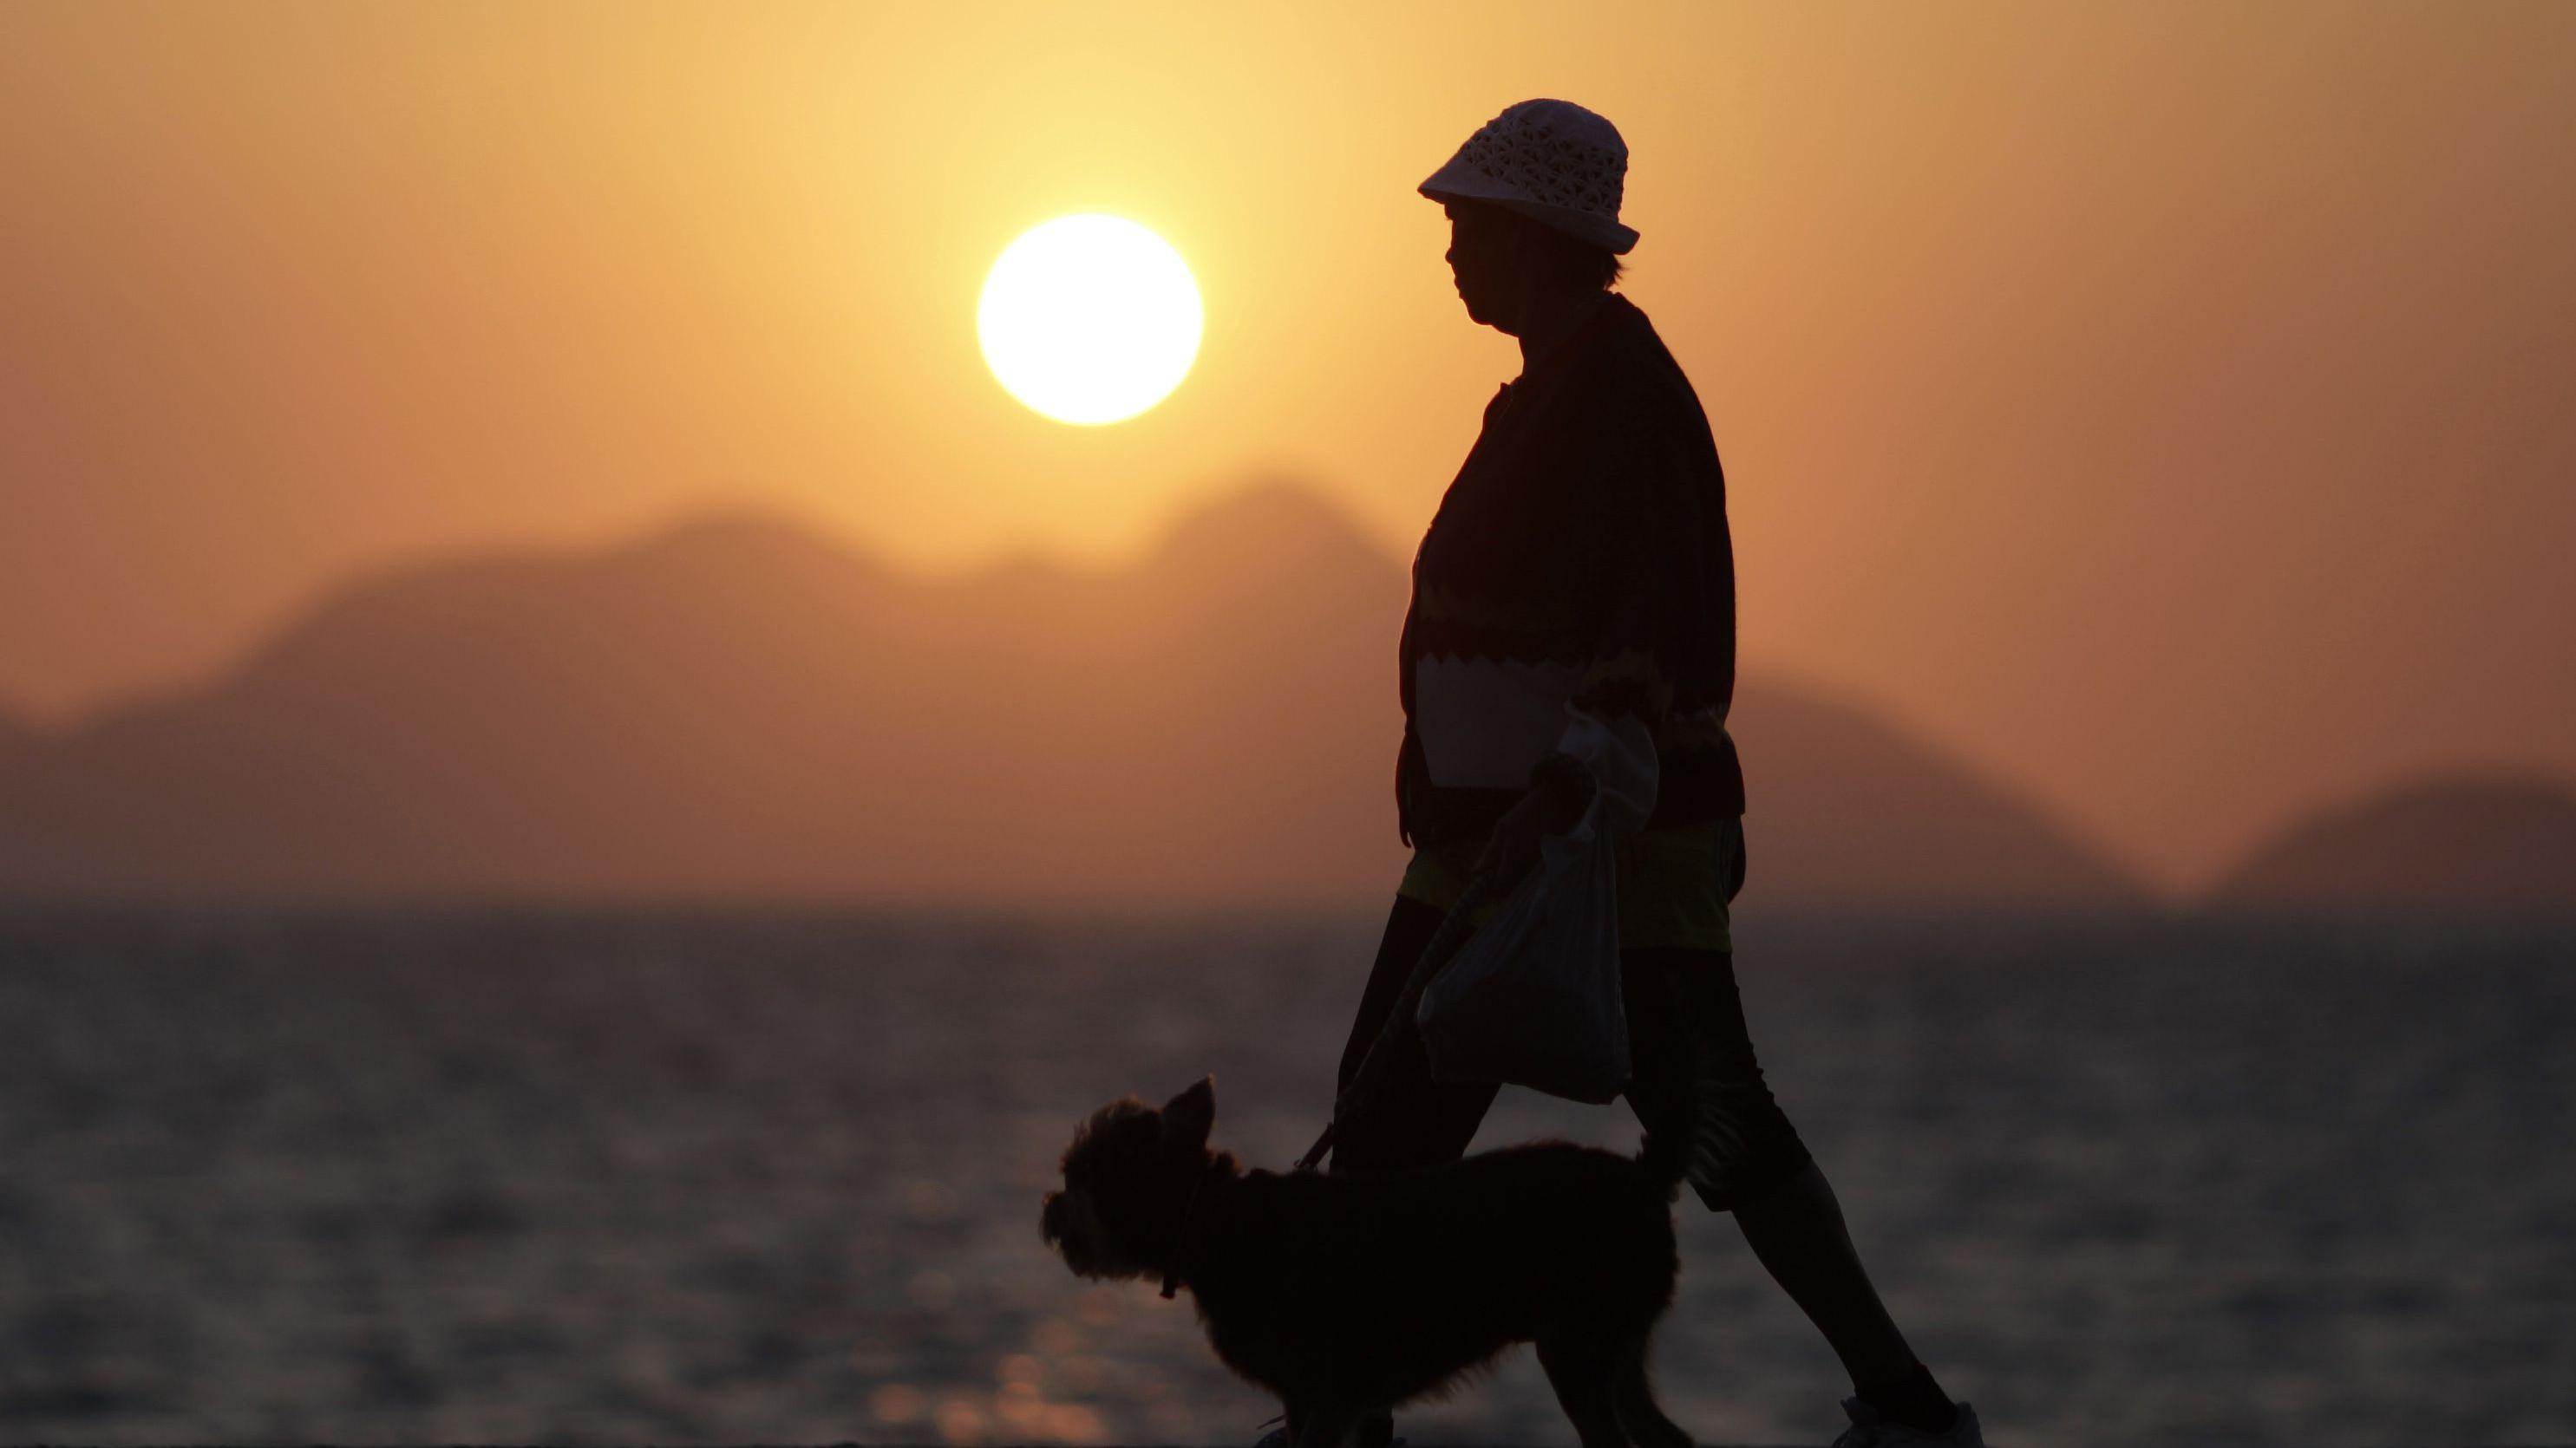 An elderly lady walks with her dog in Copacabana in Rio de Janeiro